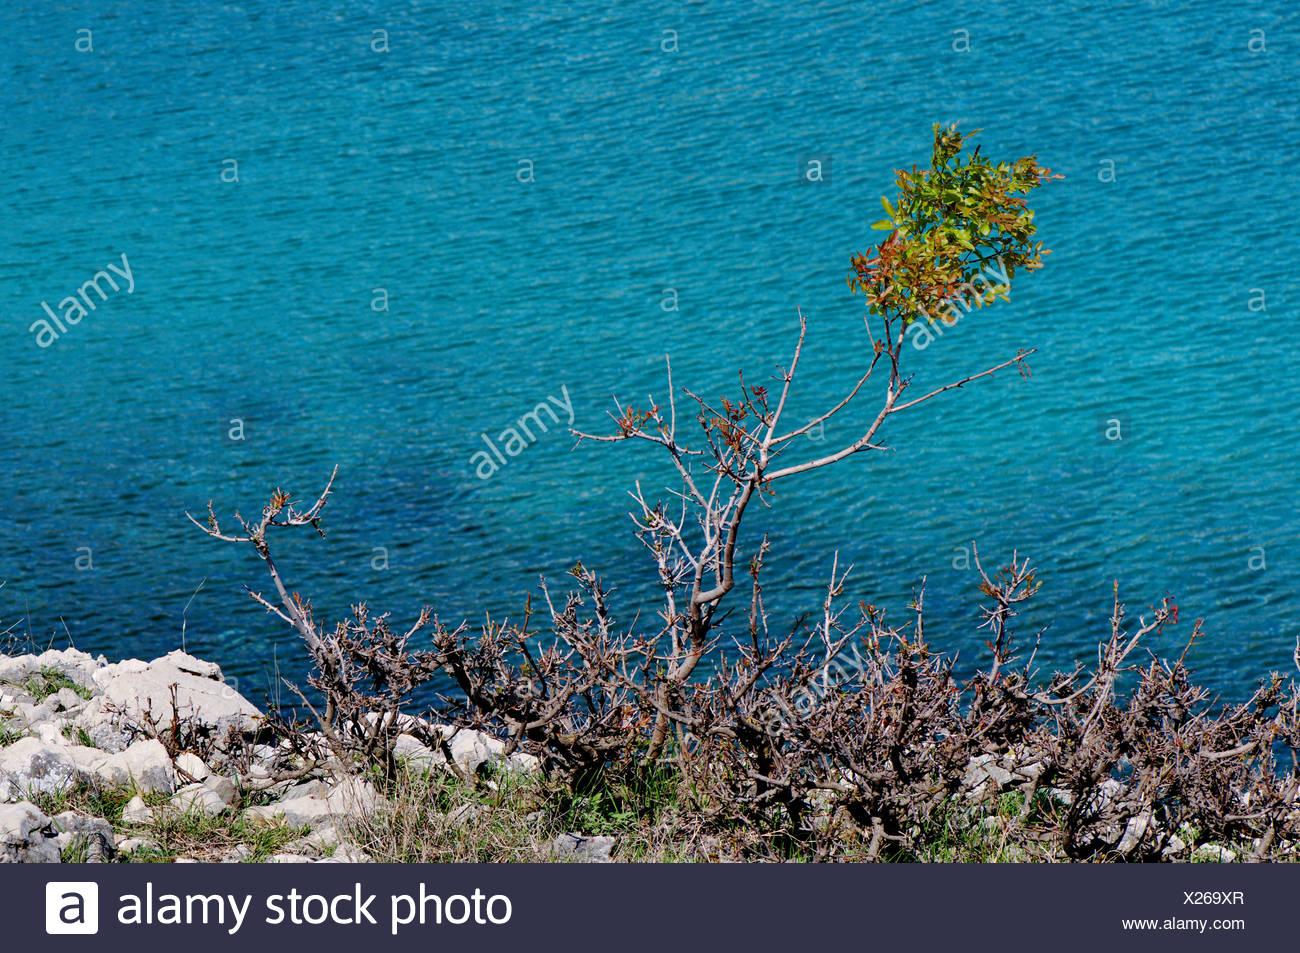 sea, Mediterranean sea, Adria, mediterranean, water, macchia, karst, Croatia, Krk, turquoise, turquoise blue, blue, holiday, vac - Stock Image